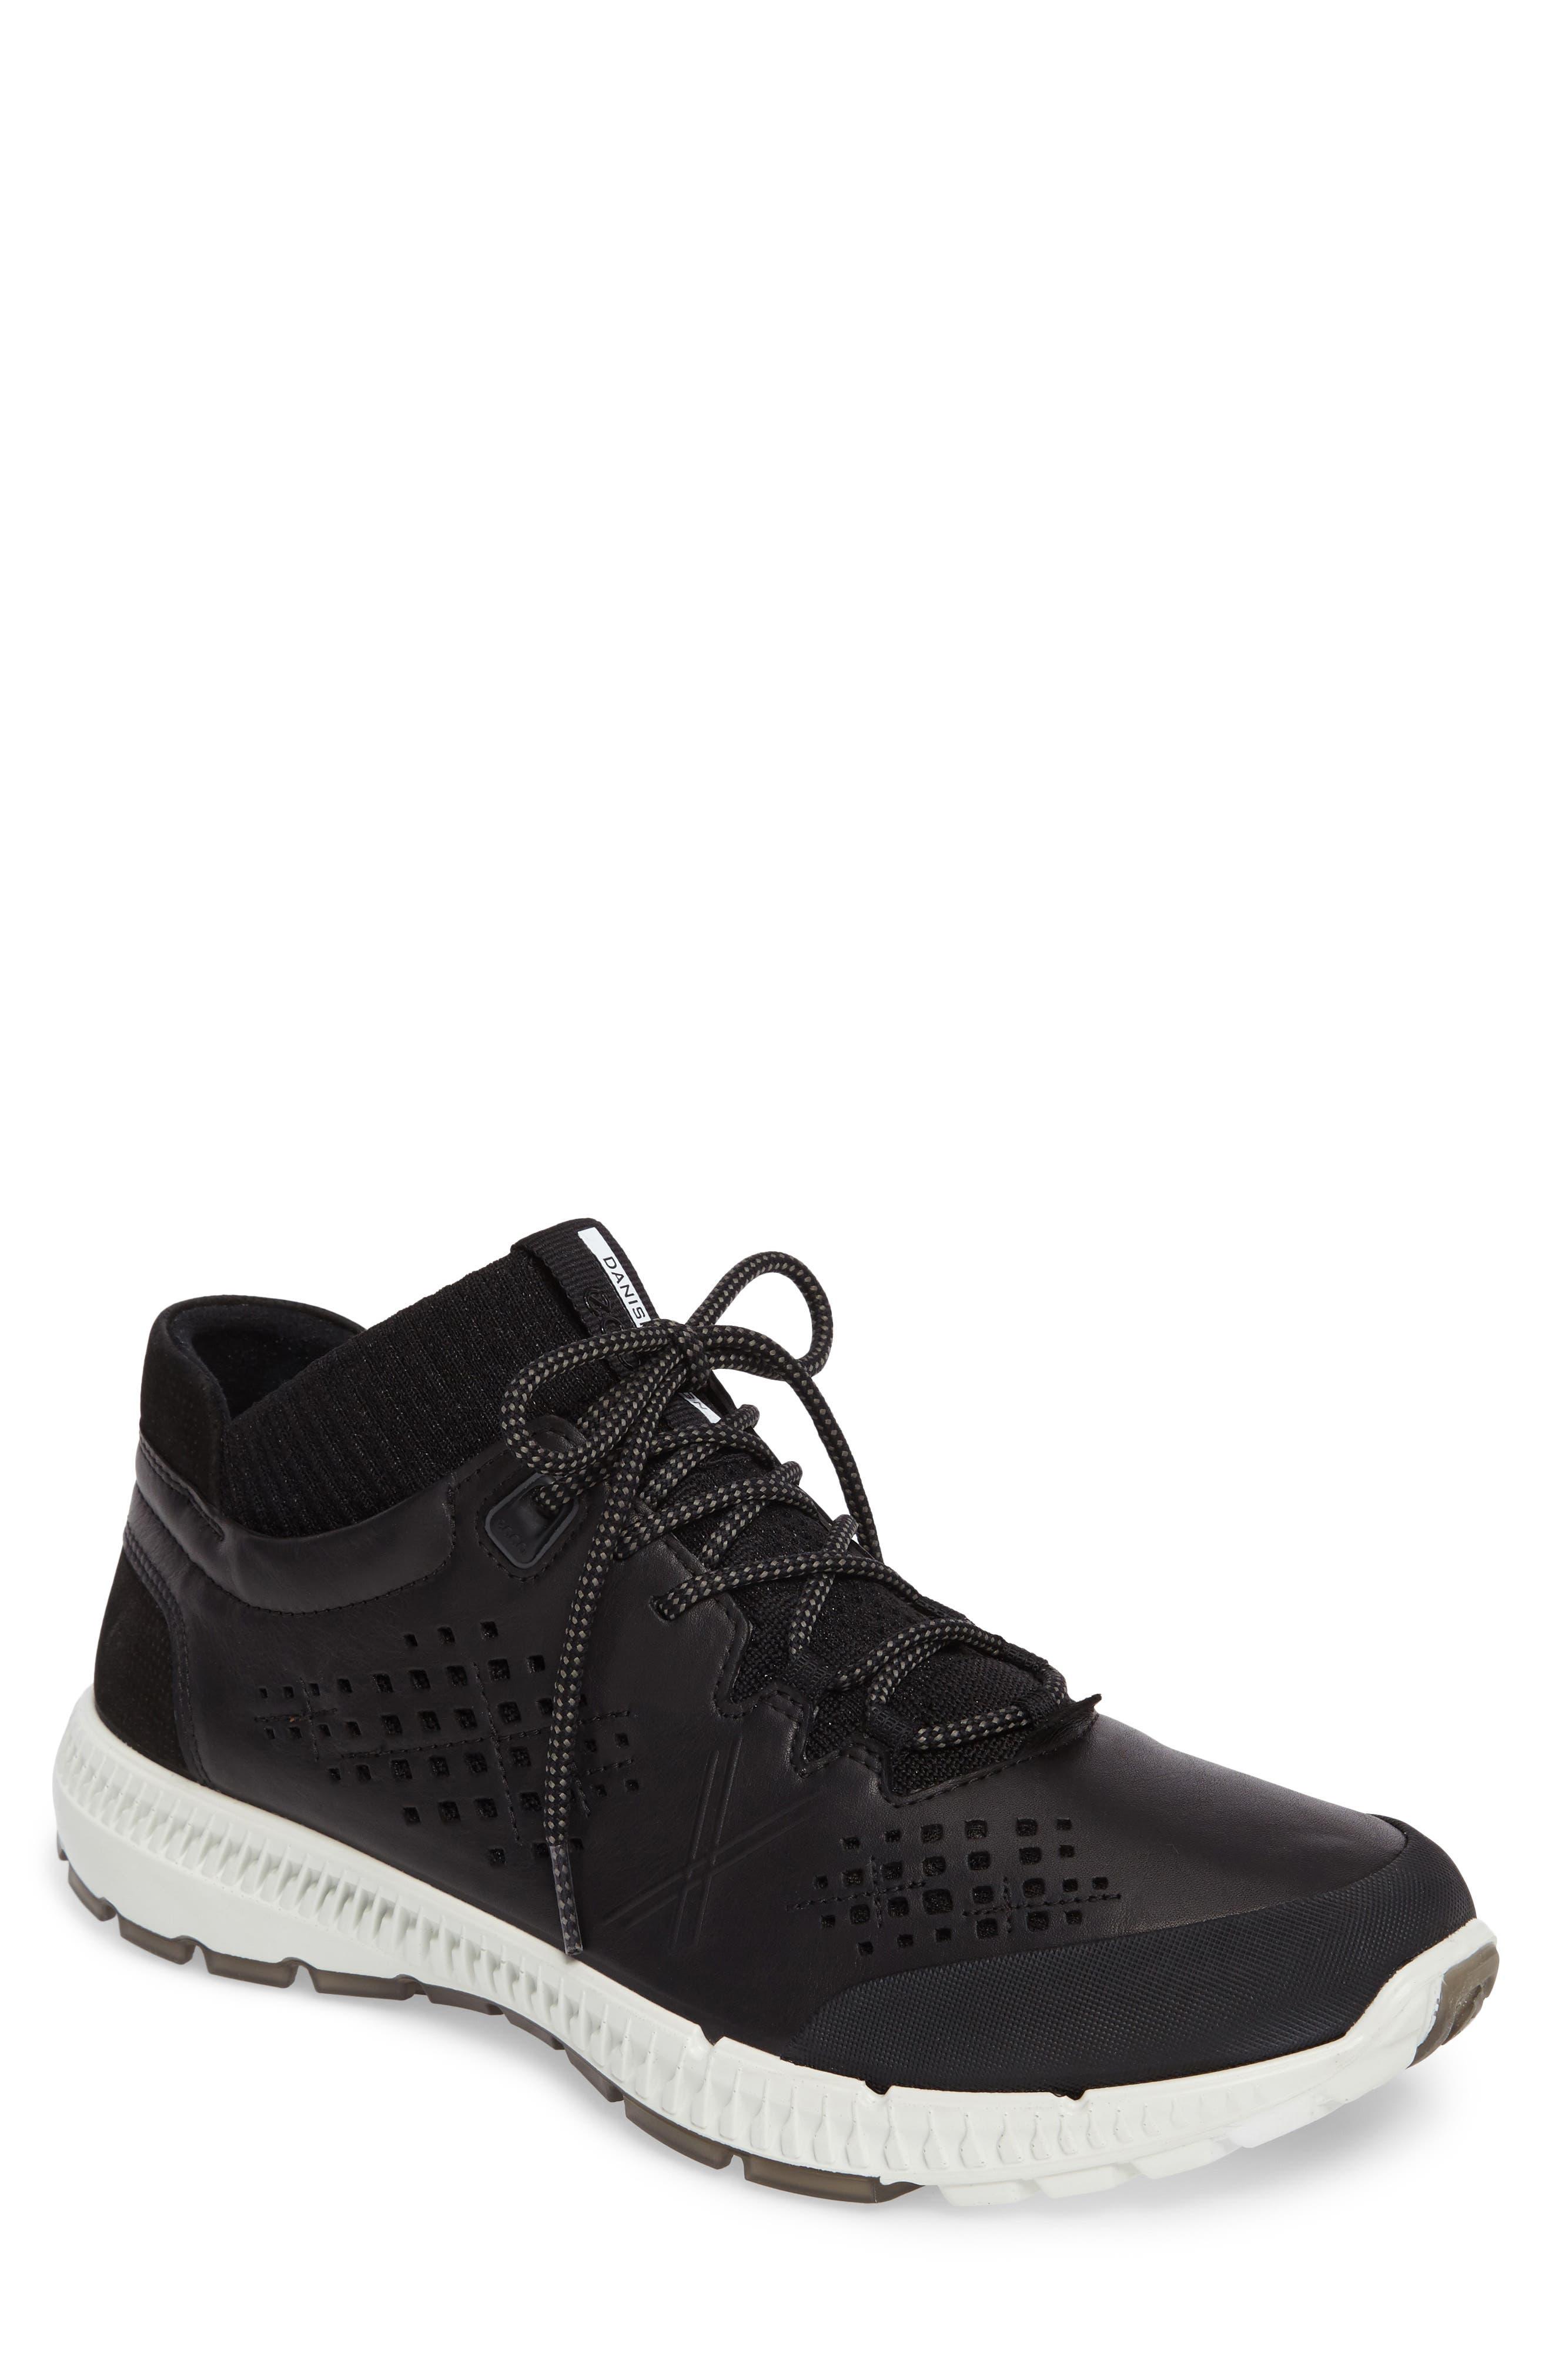 Main Image - Ecco Intrinsic Mid Sneaker (Men)